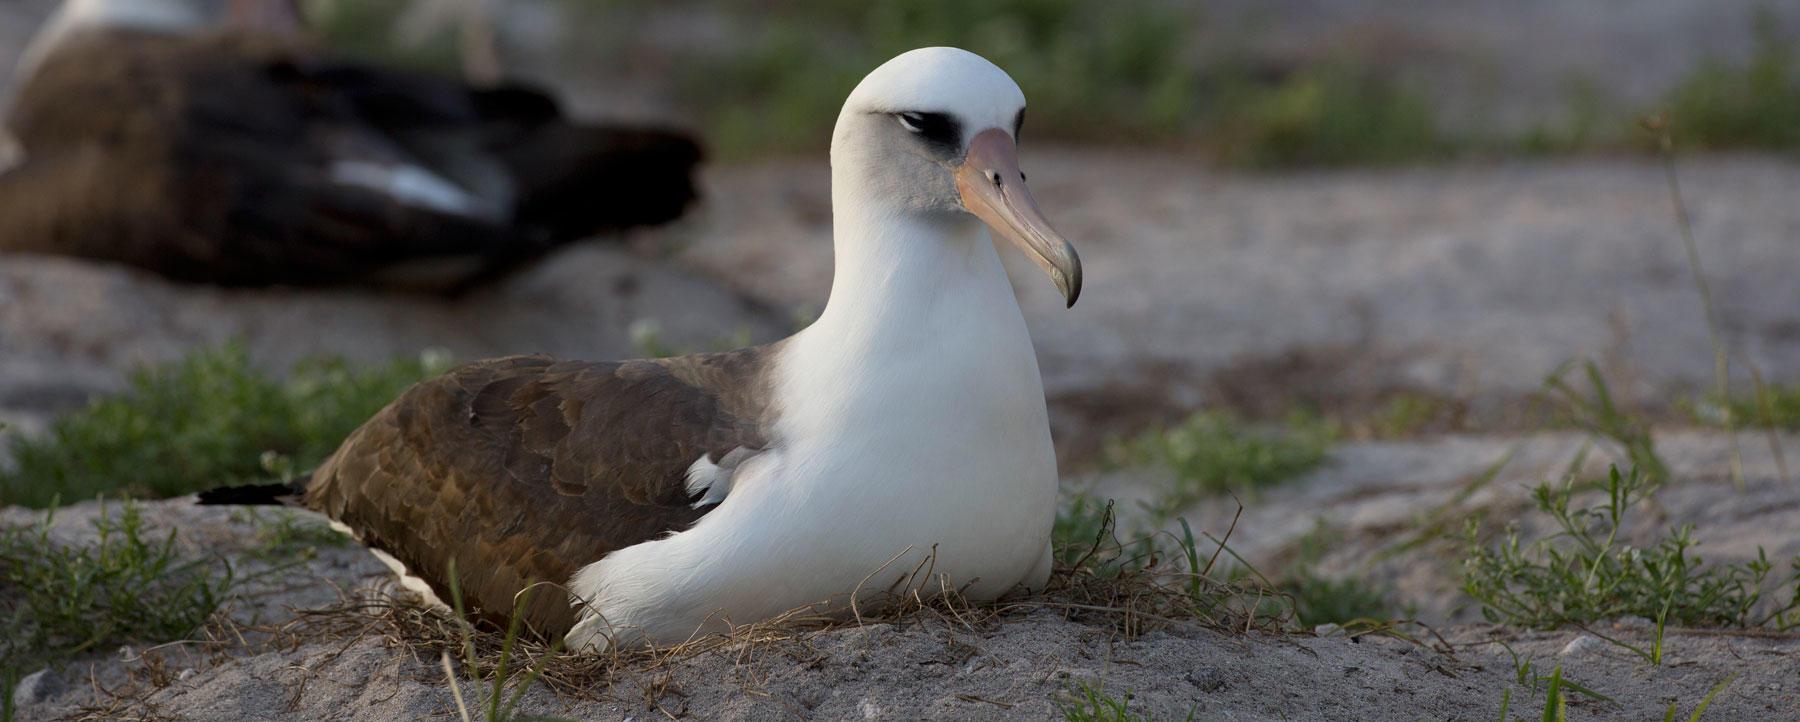 Wisdom, the world's oldest bird